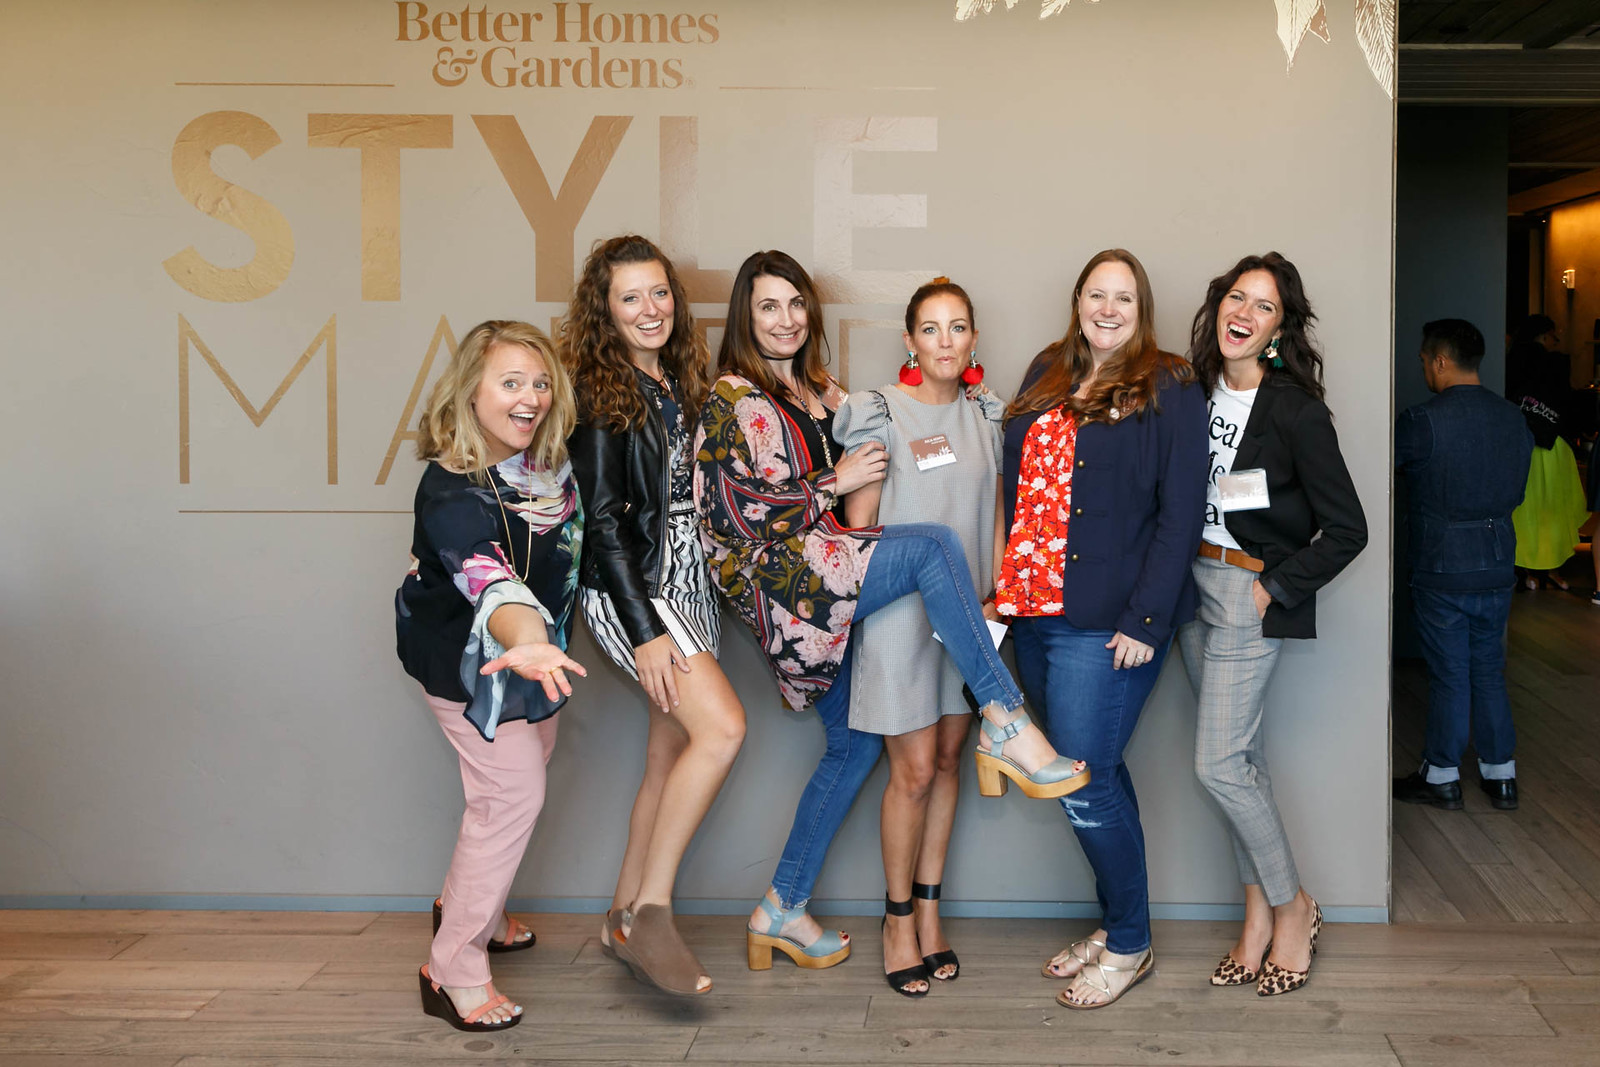 Bloggers gone wild at BHG Stylemaker event kellyelko.com